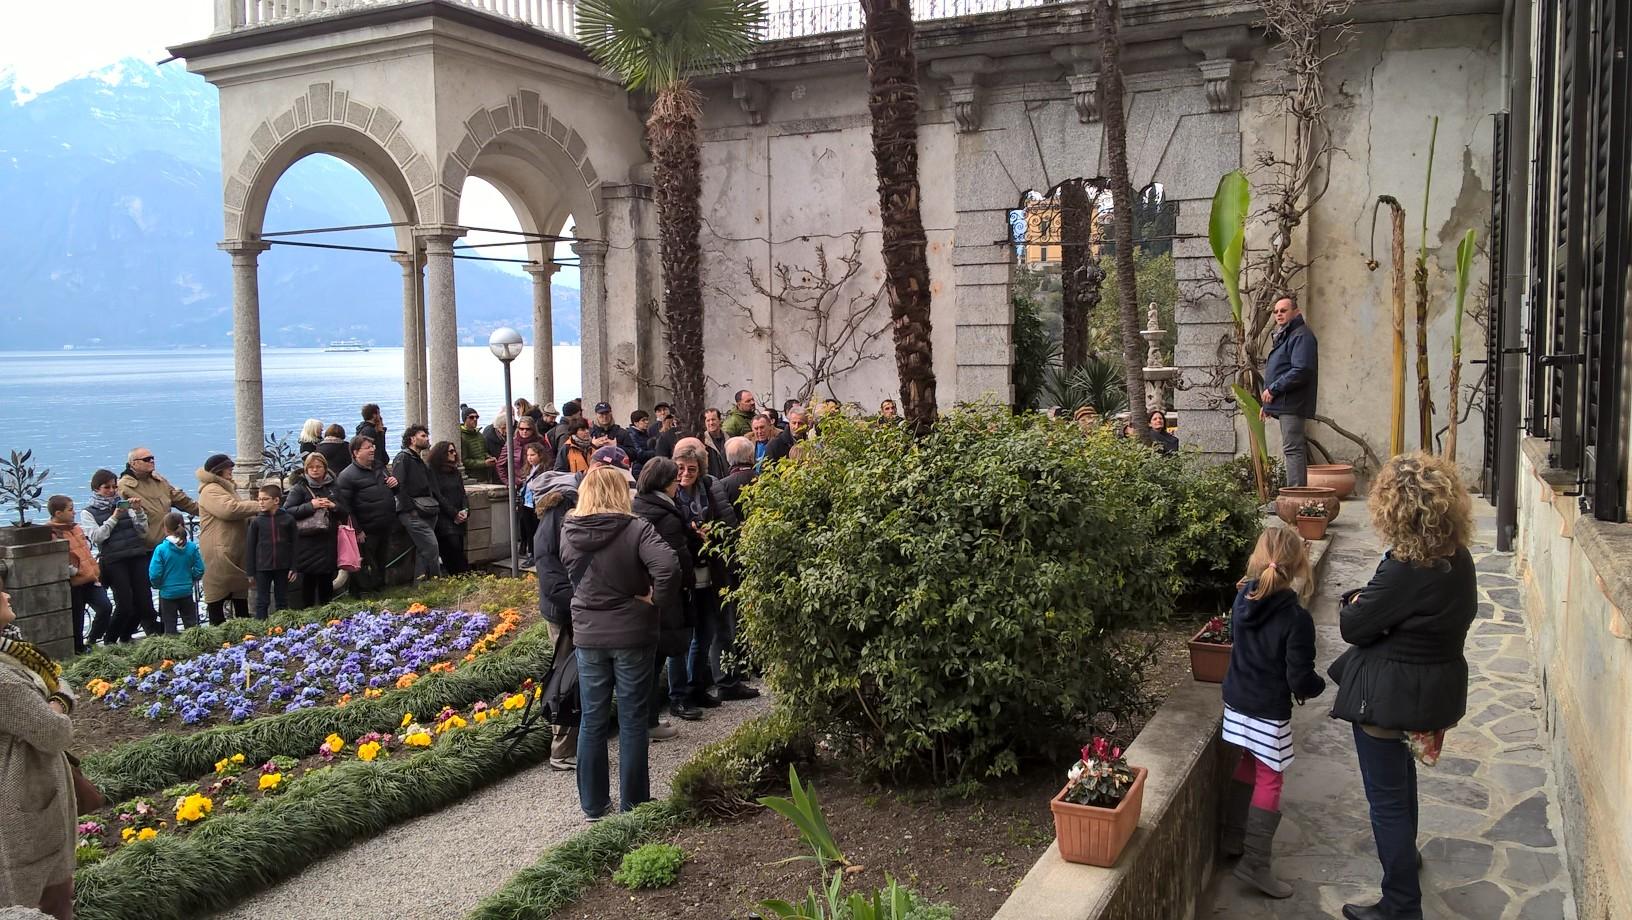 Casa Museo Villa Monastero E Giardino Botanico